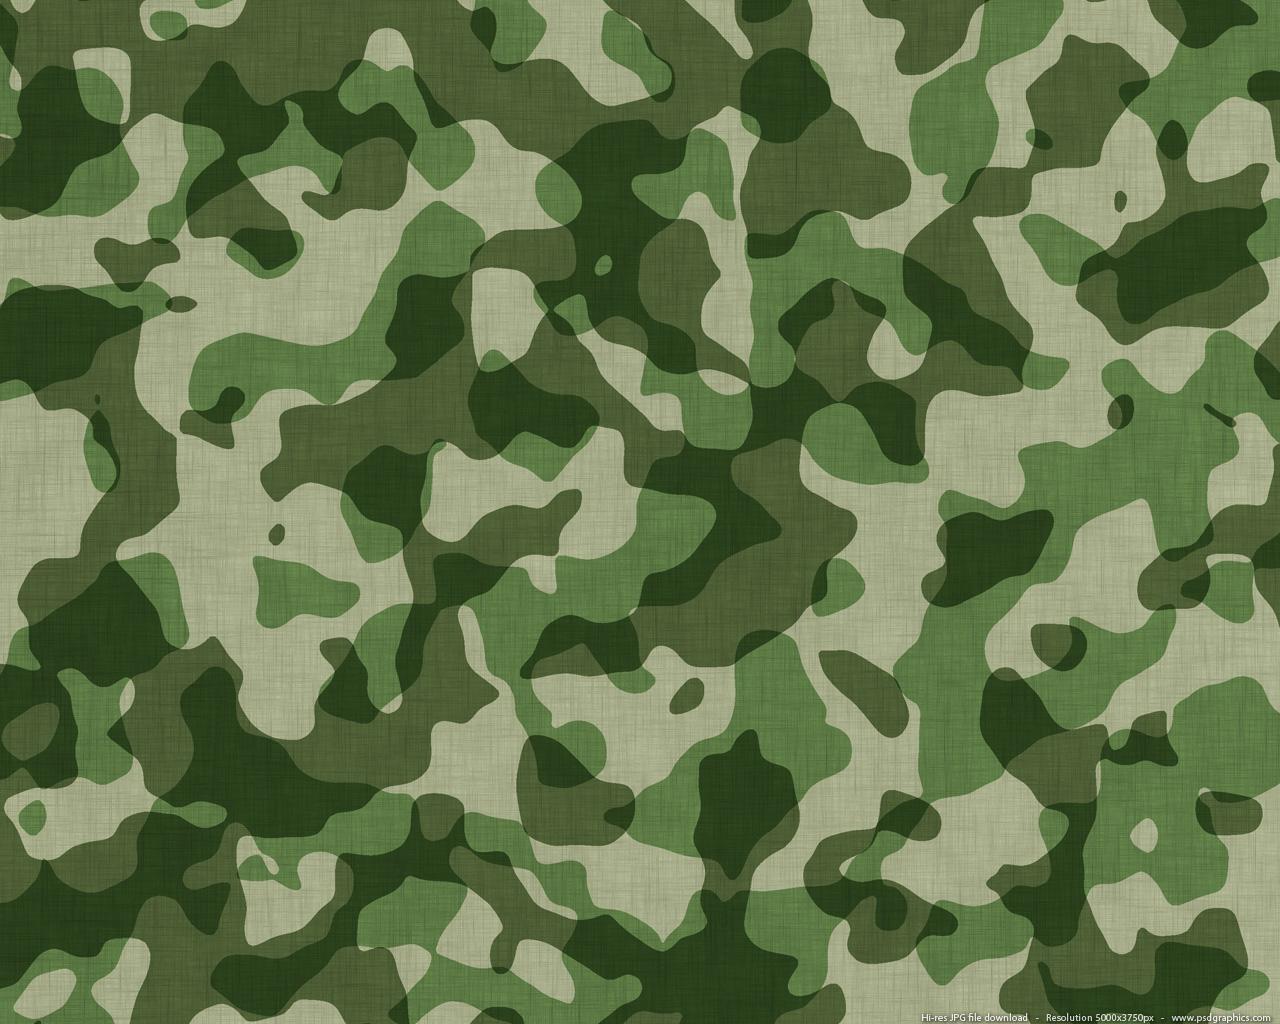 Camo backgrounds wallpapersafari military camouflage pattern psdgraphics 1280x1024 toneelgroepblik Image collections